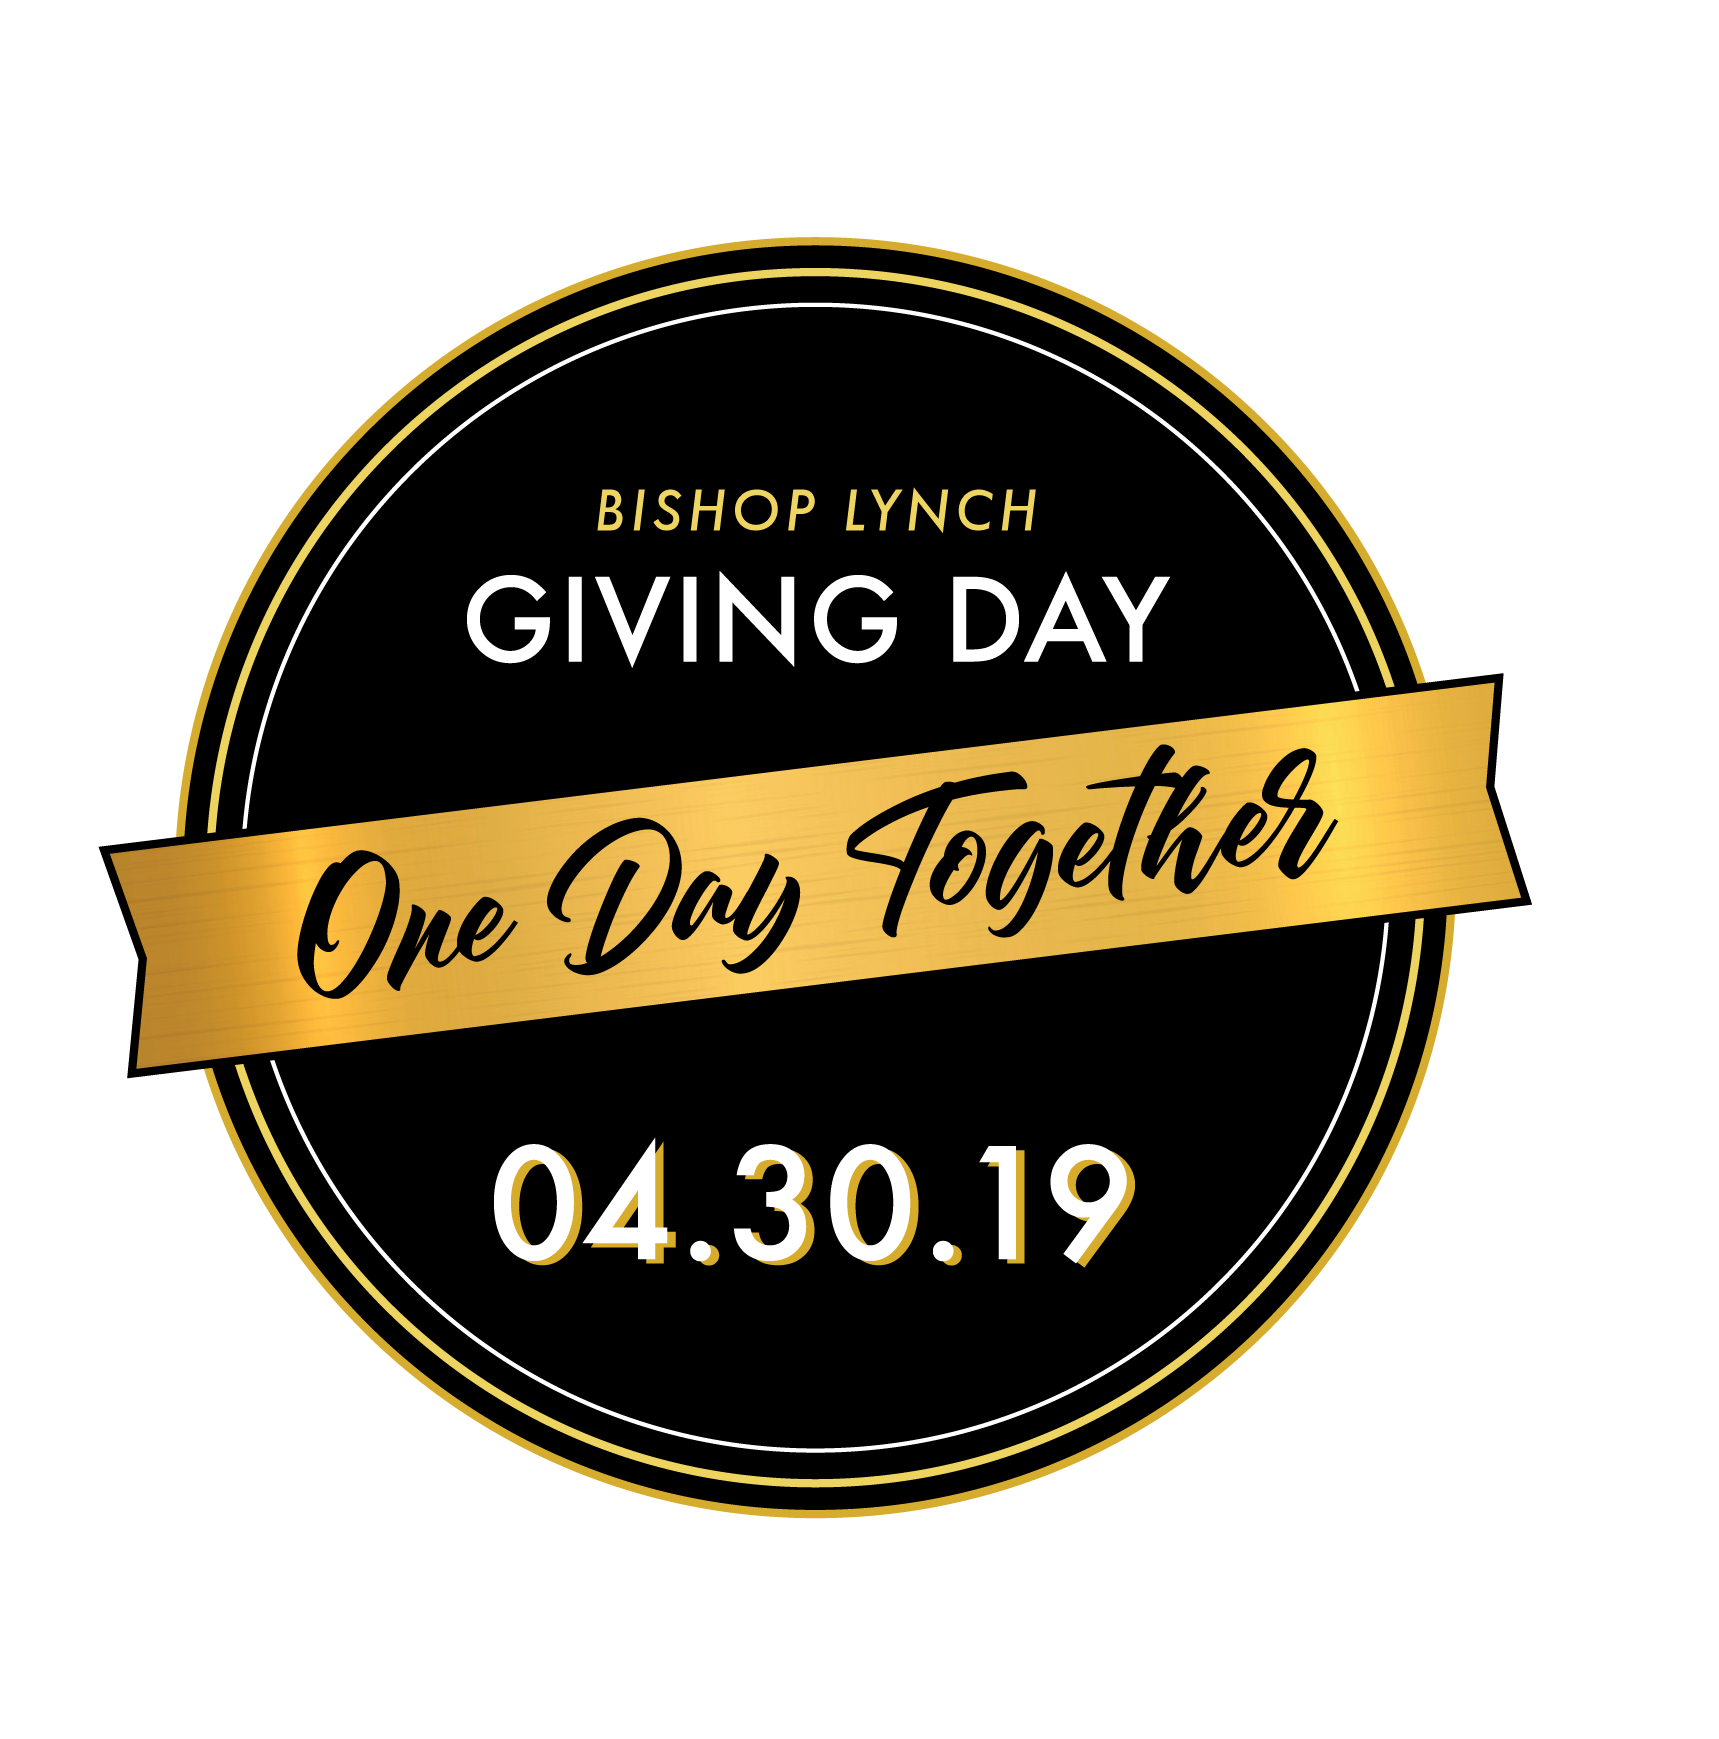 2019 givingday logo